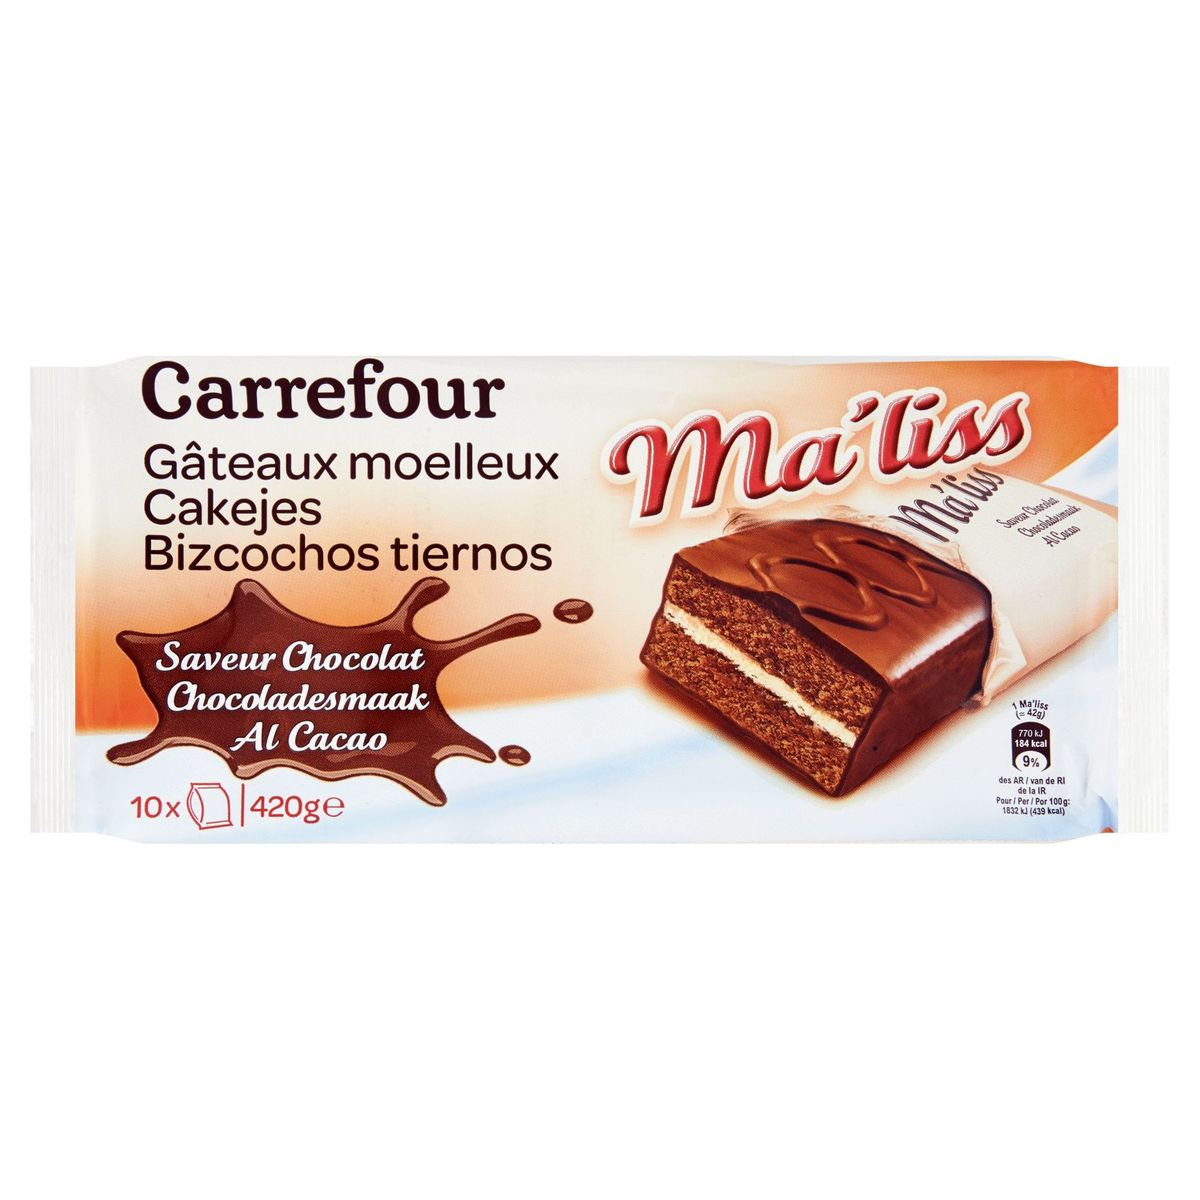 Carrefour Ma'liss Cakejes Chocoladesmaak 10 x 42 g